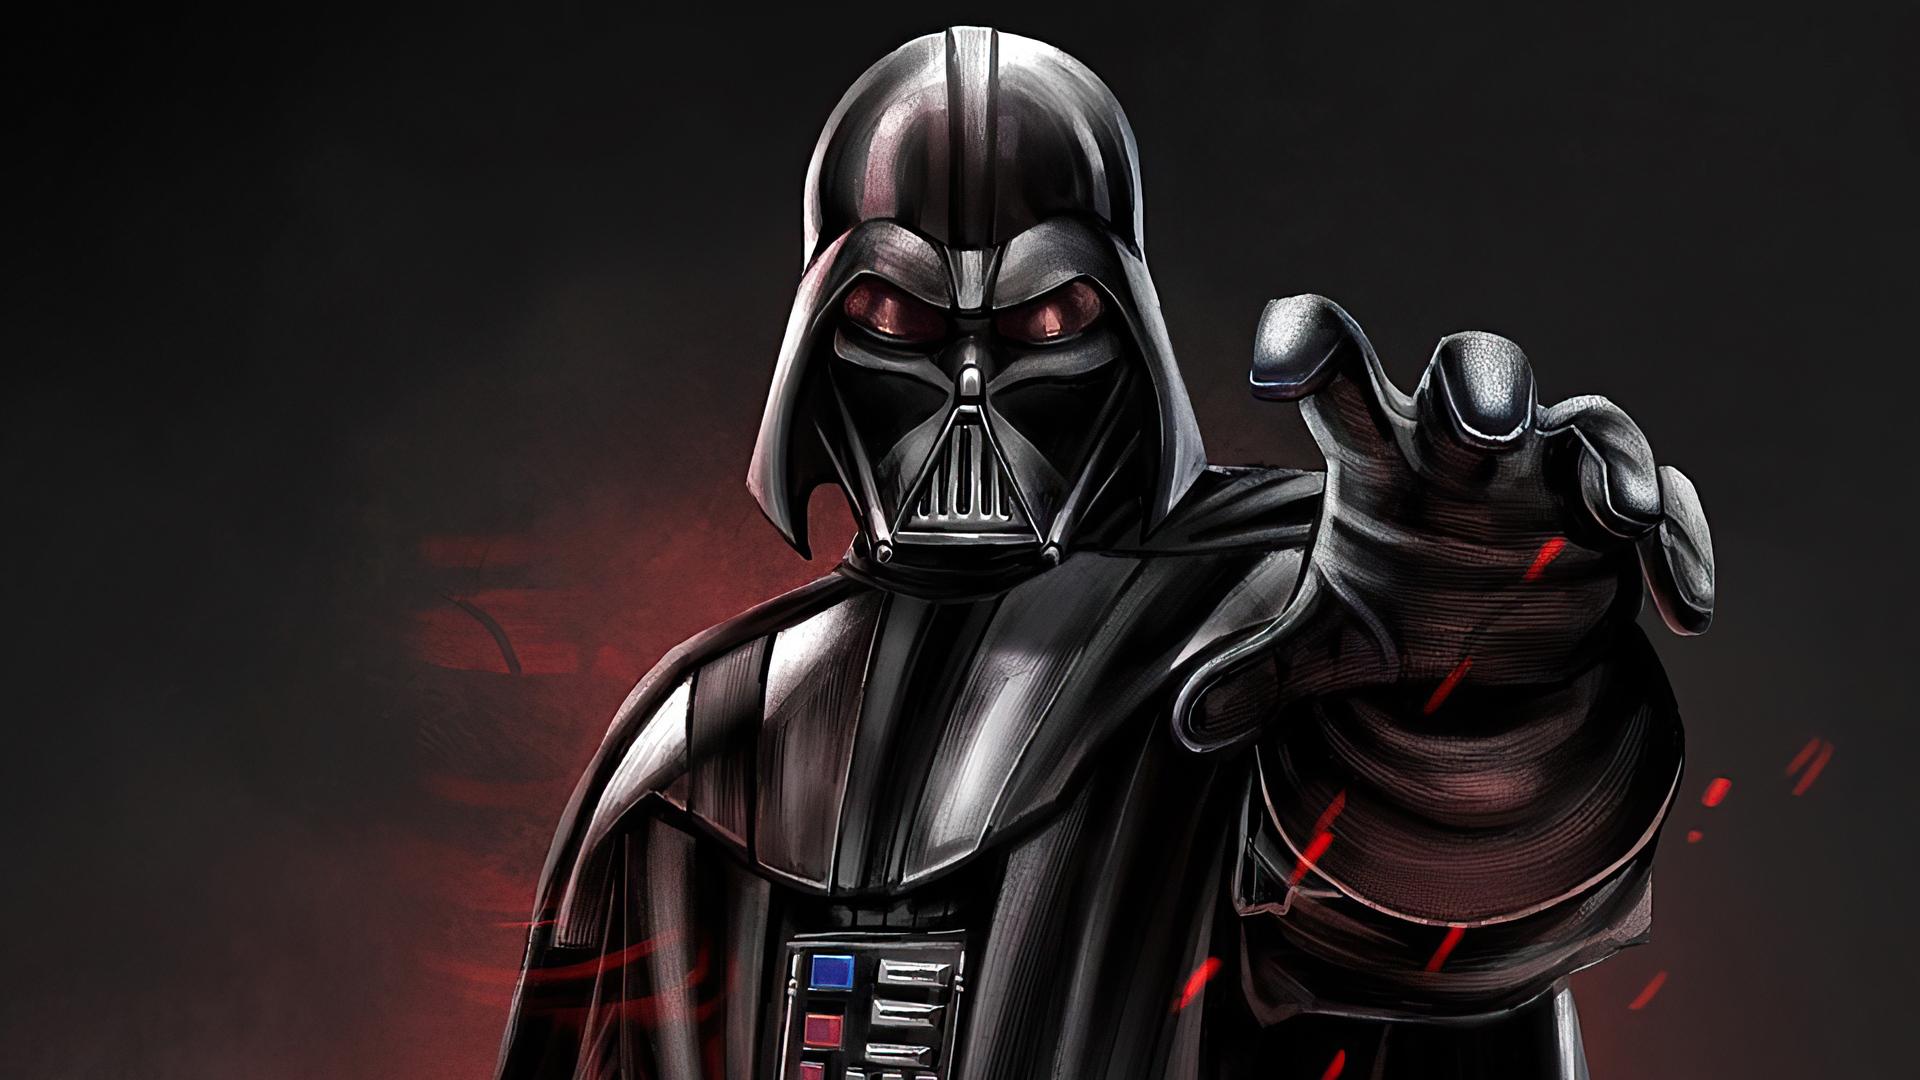 1920x1080 Darth Vader 2020 Artworks Laptop Full HD 1080P ...